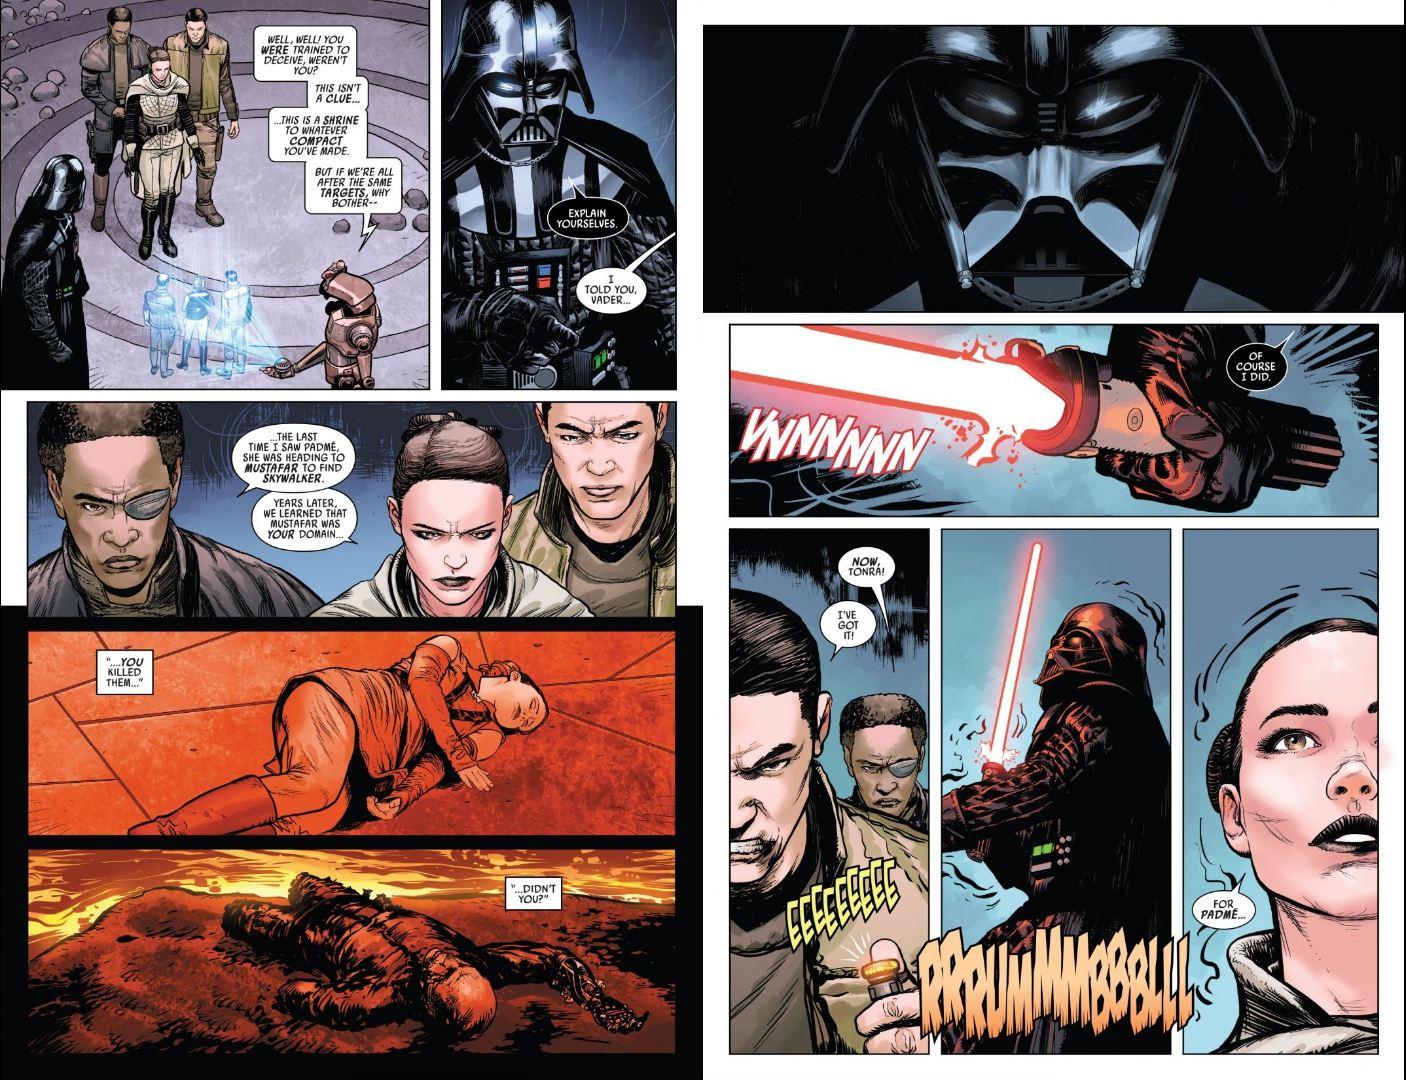 Issue #3 Star Wars Darth Vader Sabe confronts Vader